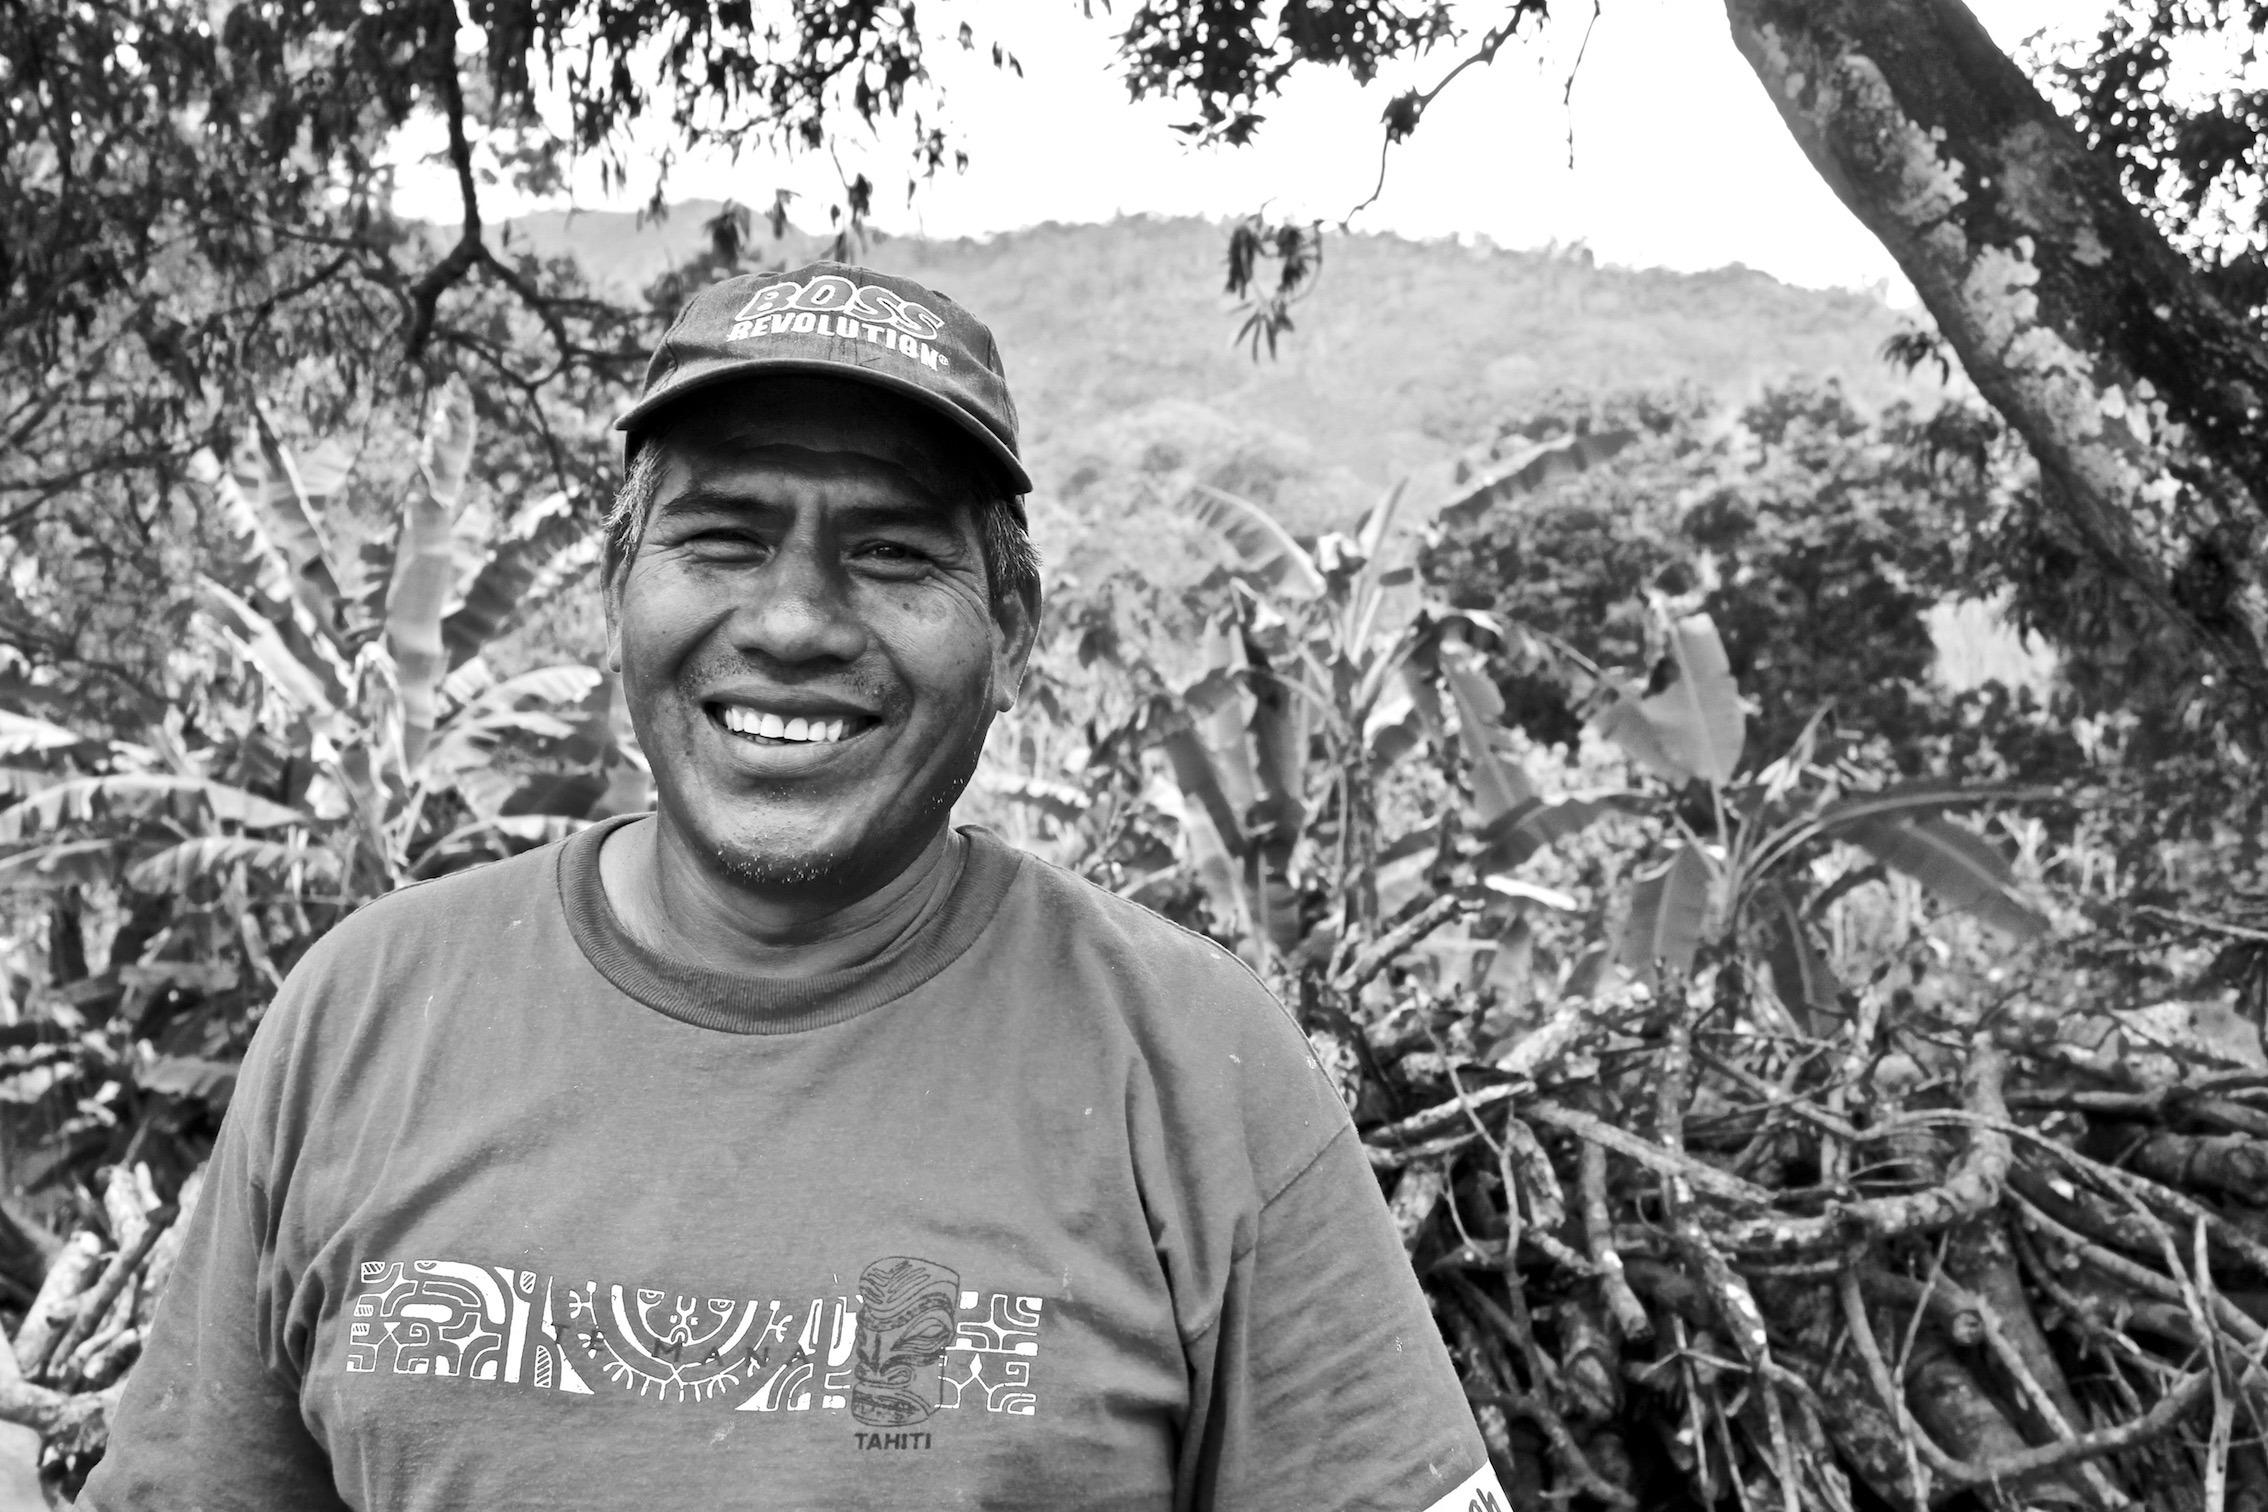 Personas Hondureñas: Meet Don Marco Ramos, Director of Construction